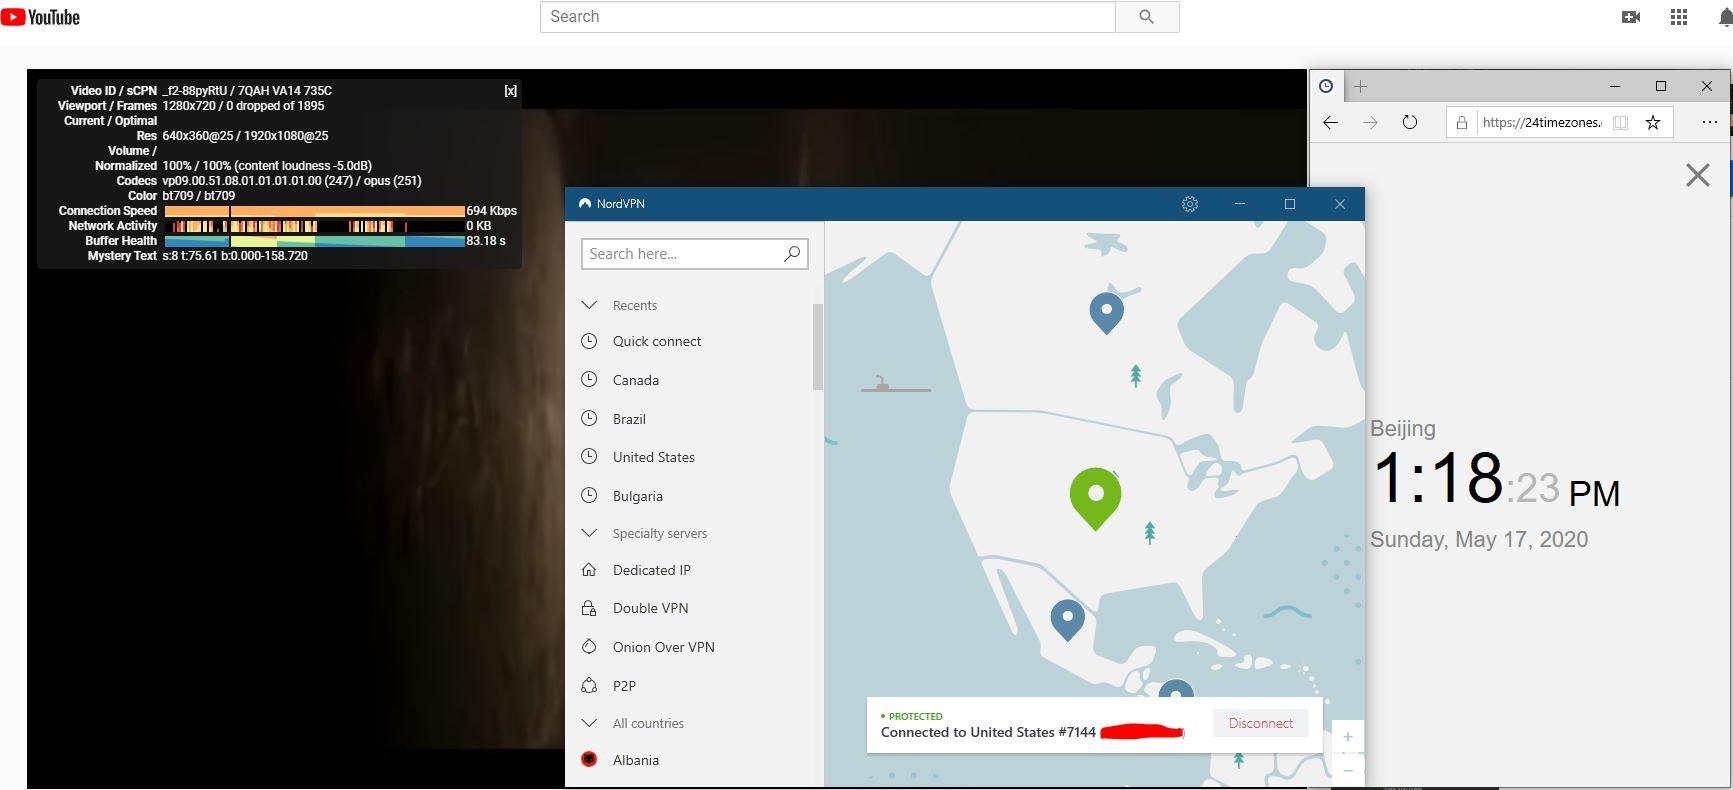 Windows10 NordVPN USA #7144 中国VPN 翻墙 科学上网 youtube测速-20200517